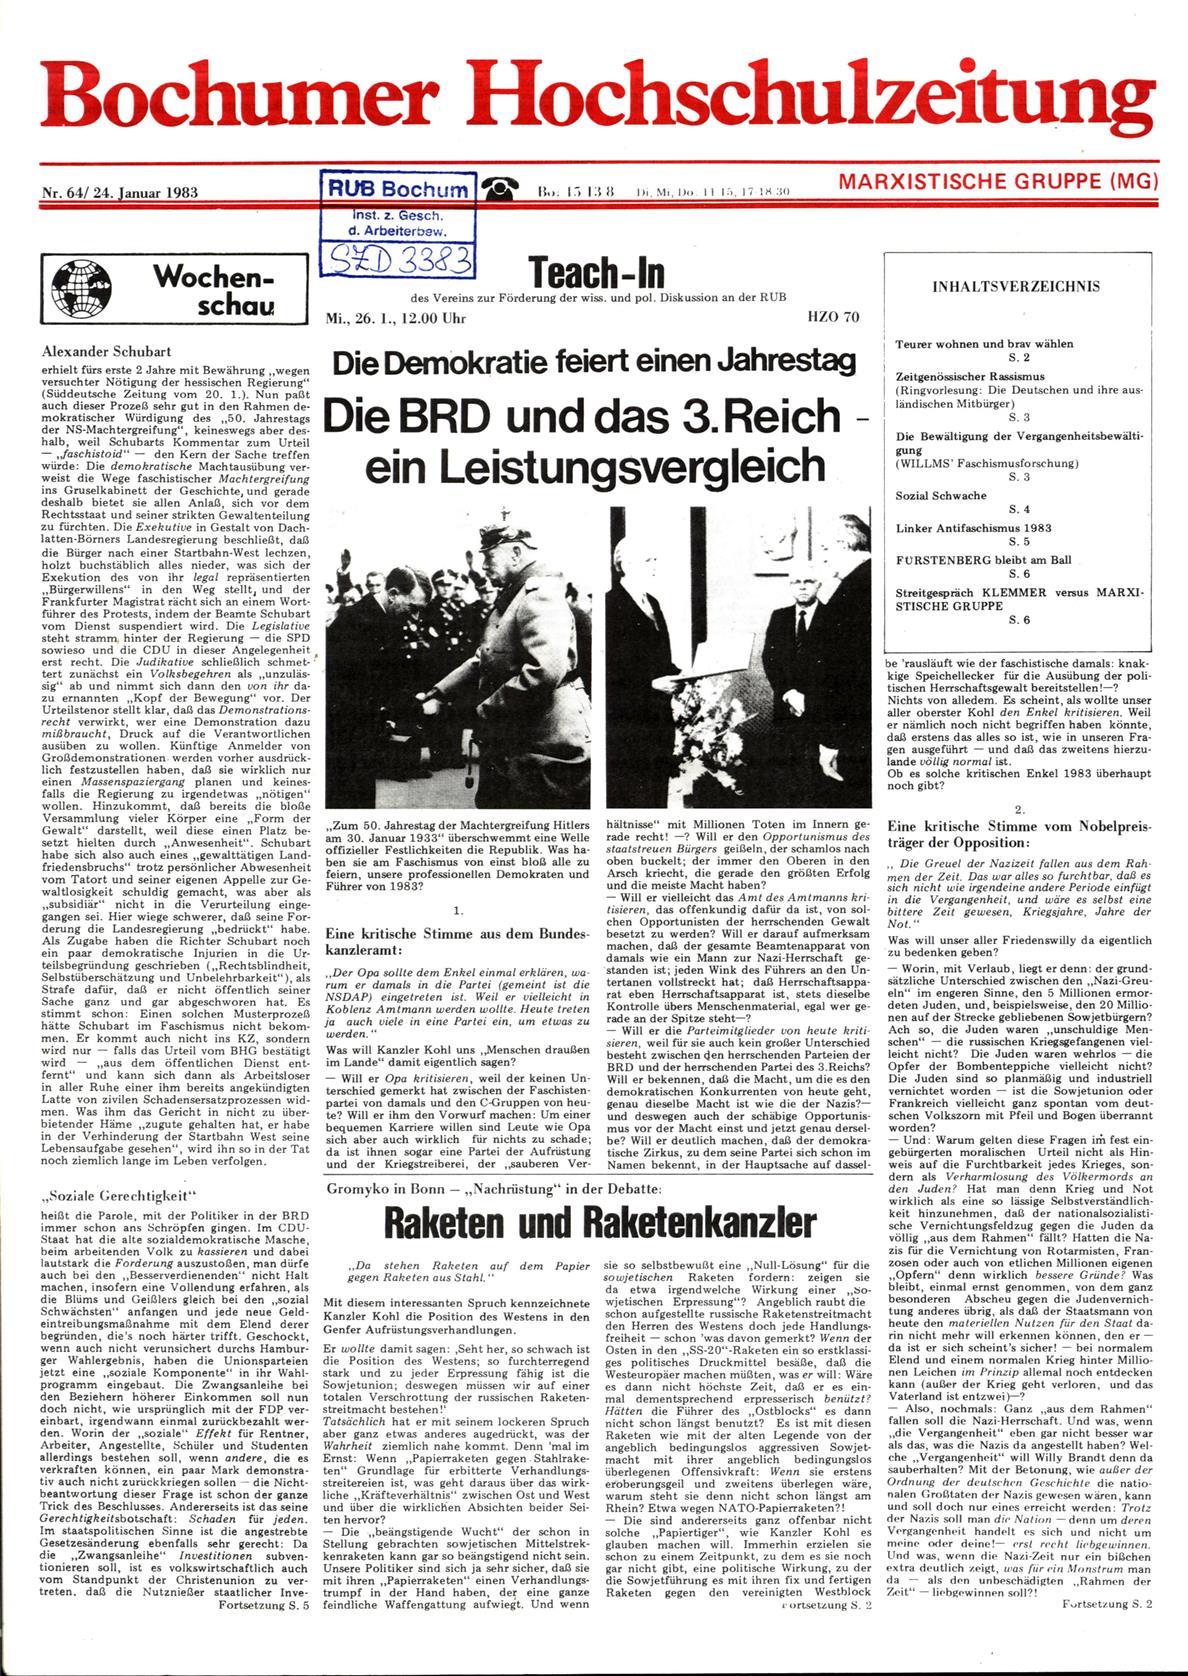 Bochum_BHZ_19830124_064_001